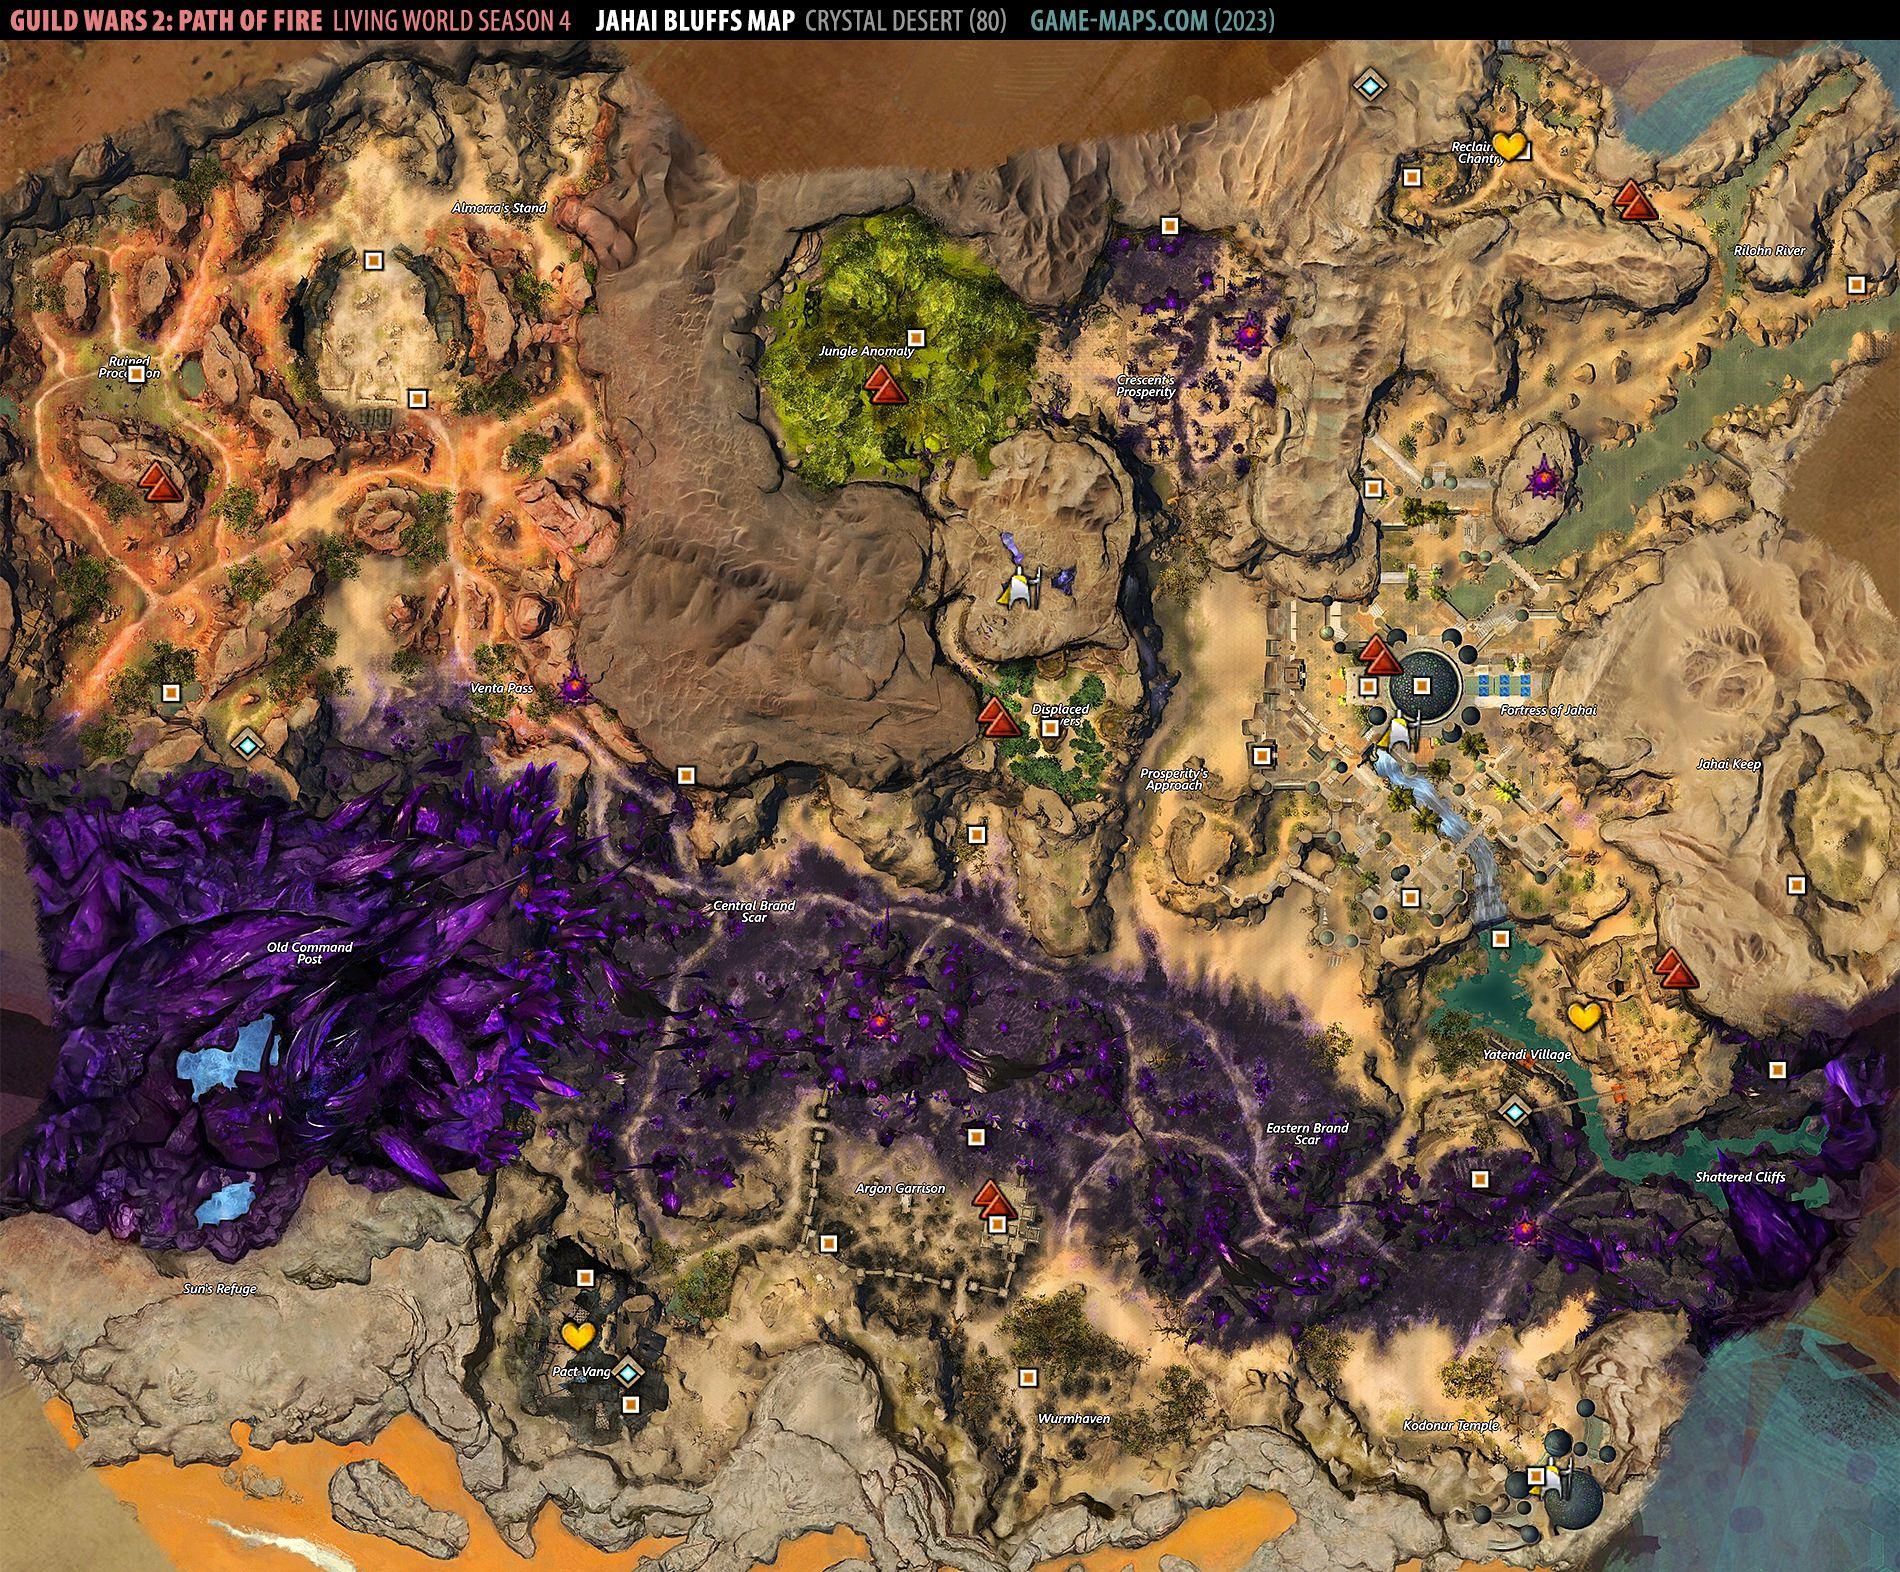 Jahai Bluffs GW2 map